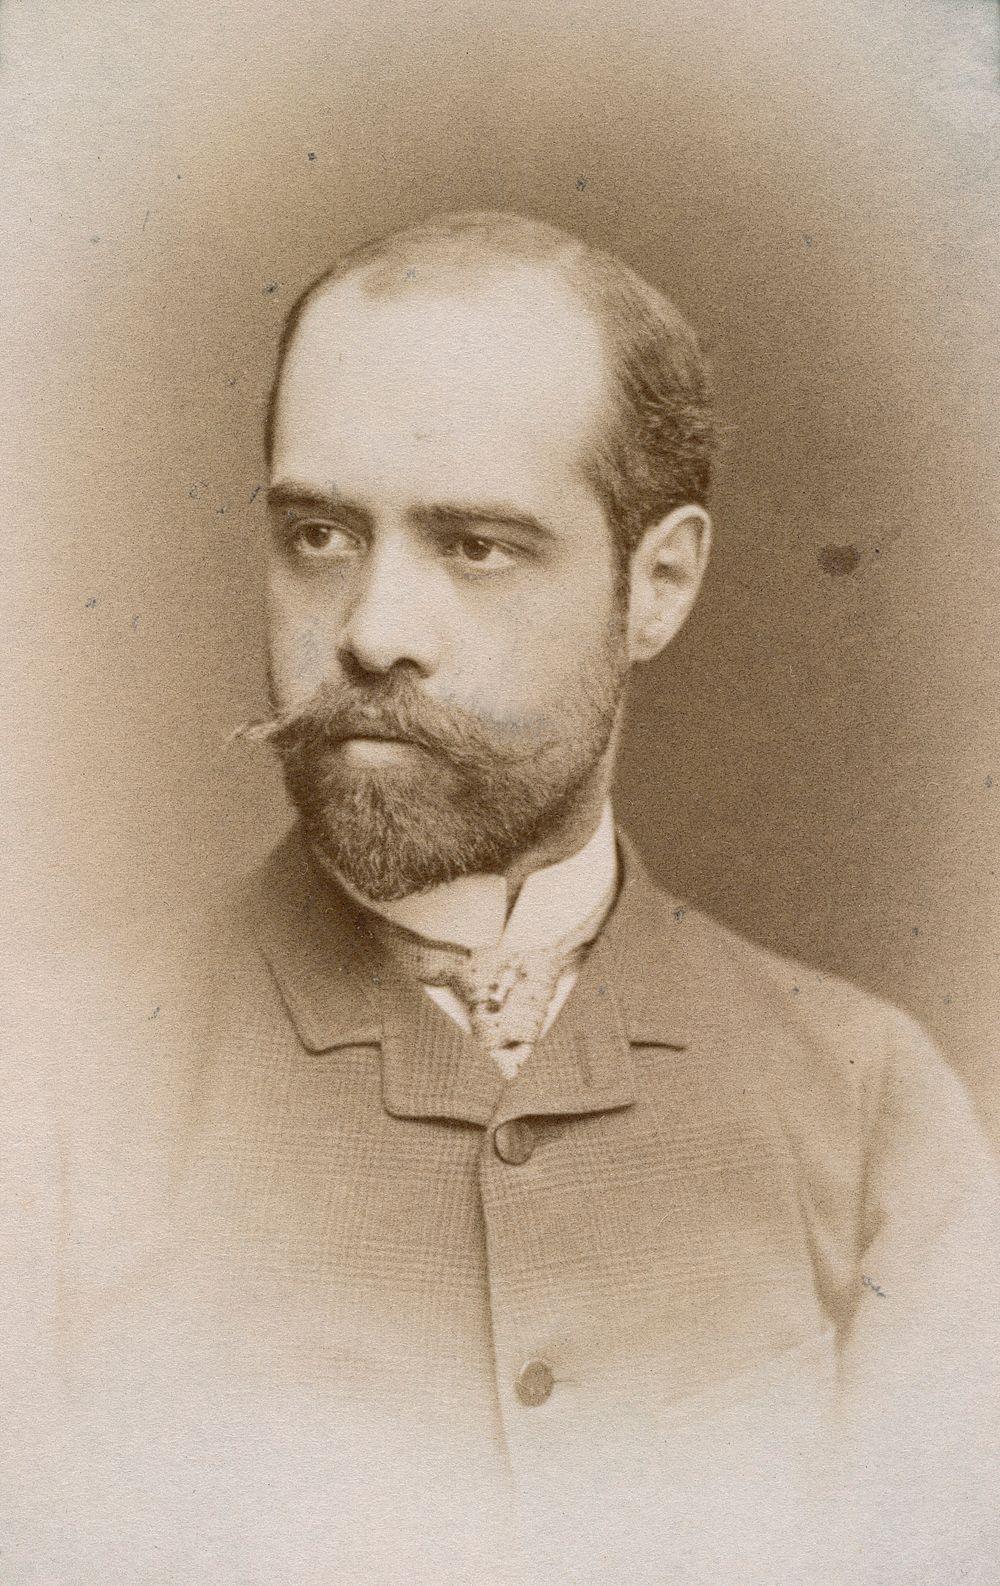 Gunnar Berndtson